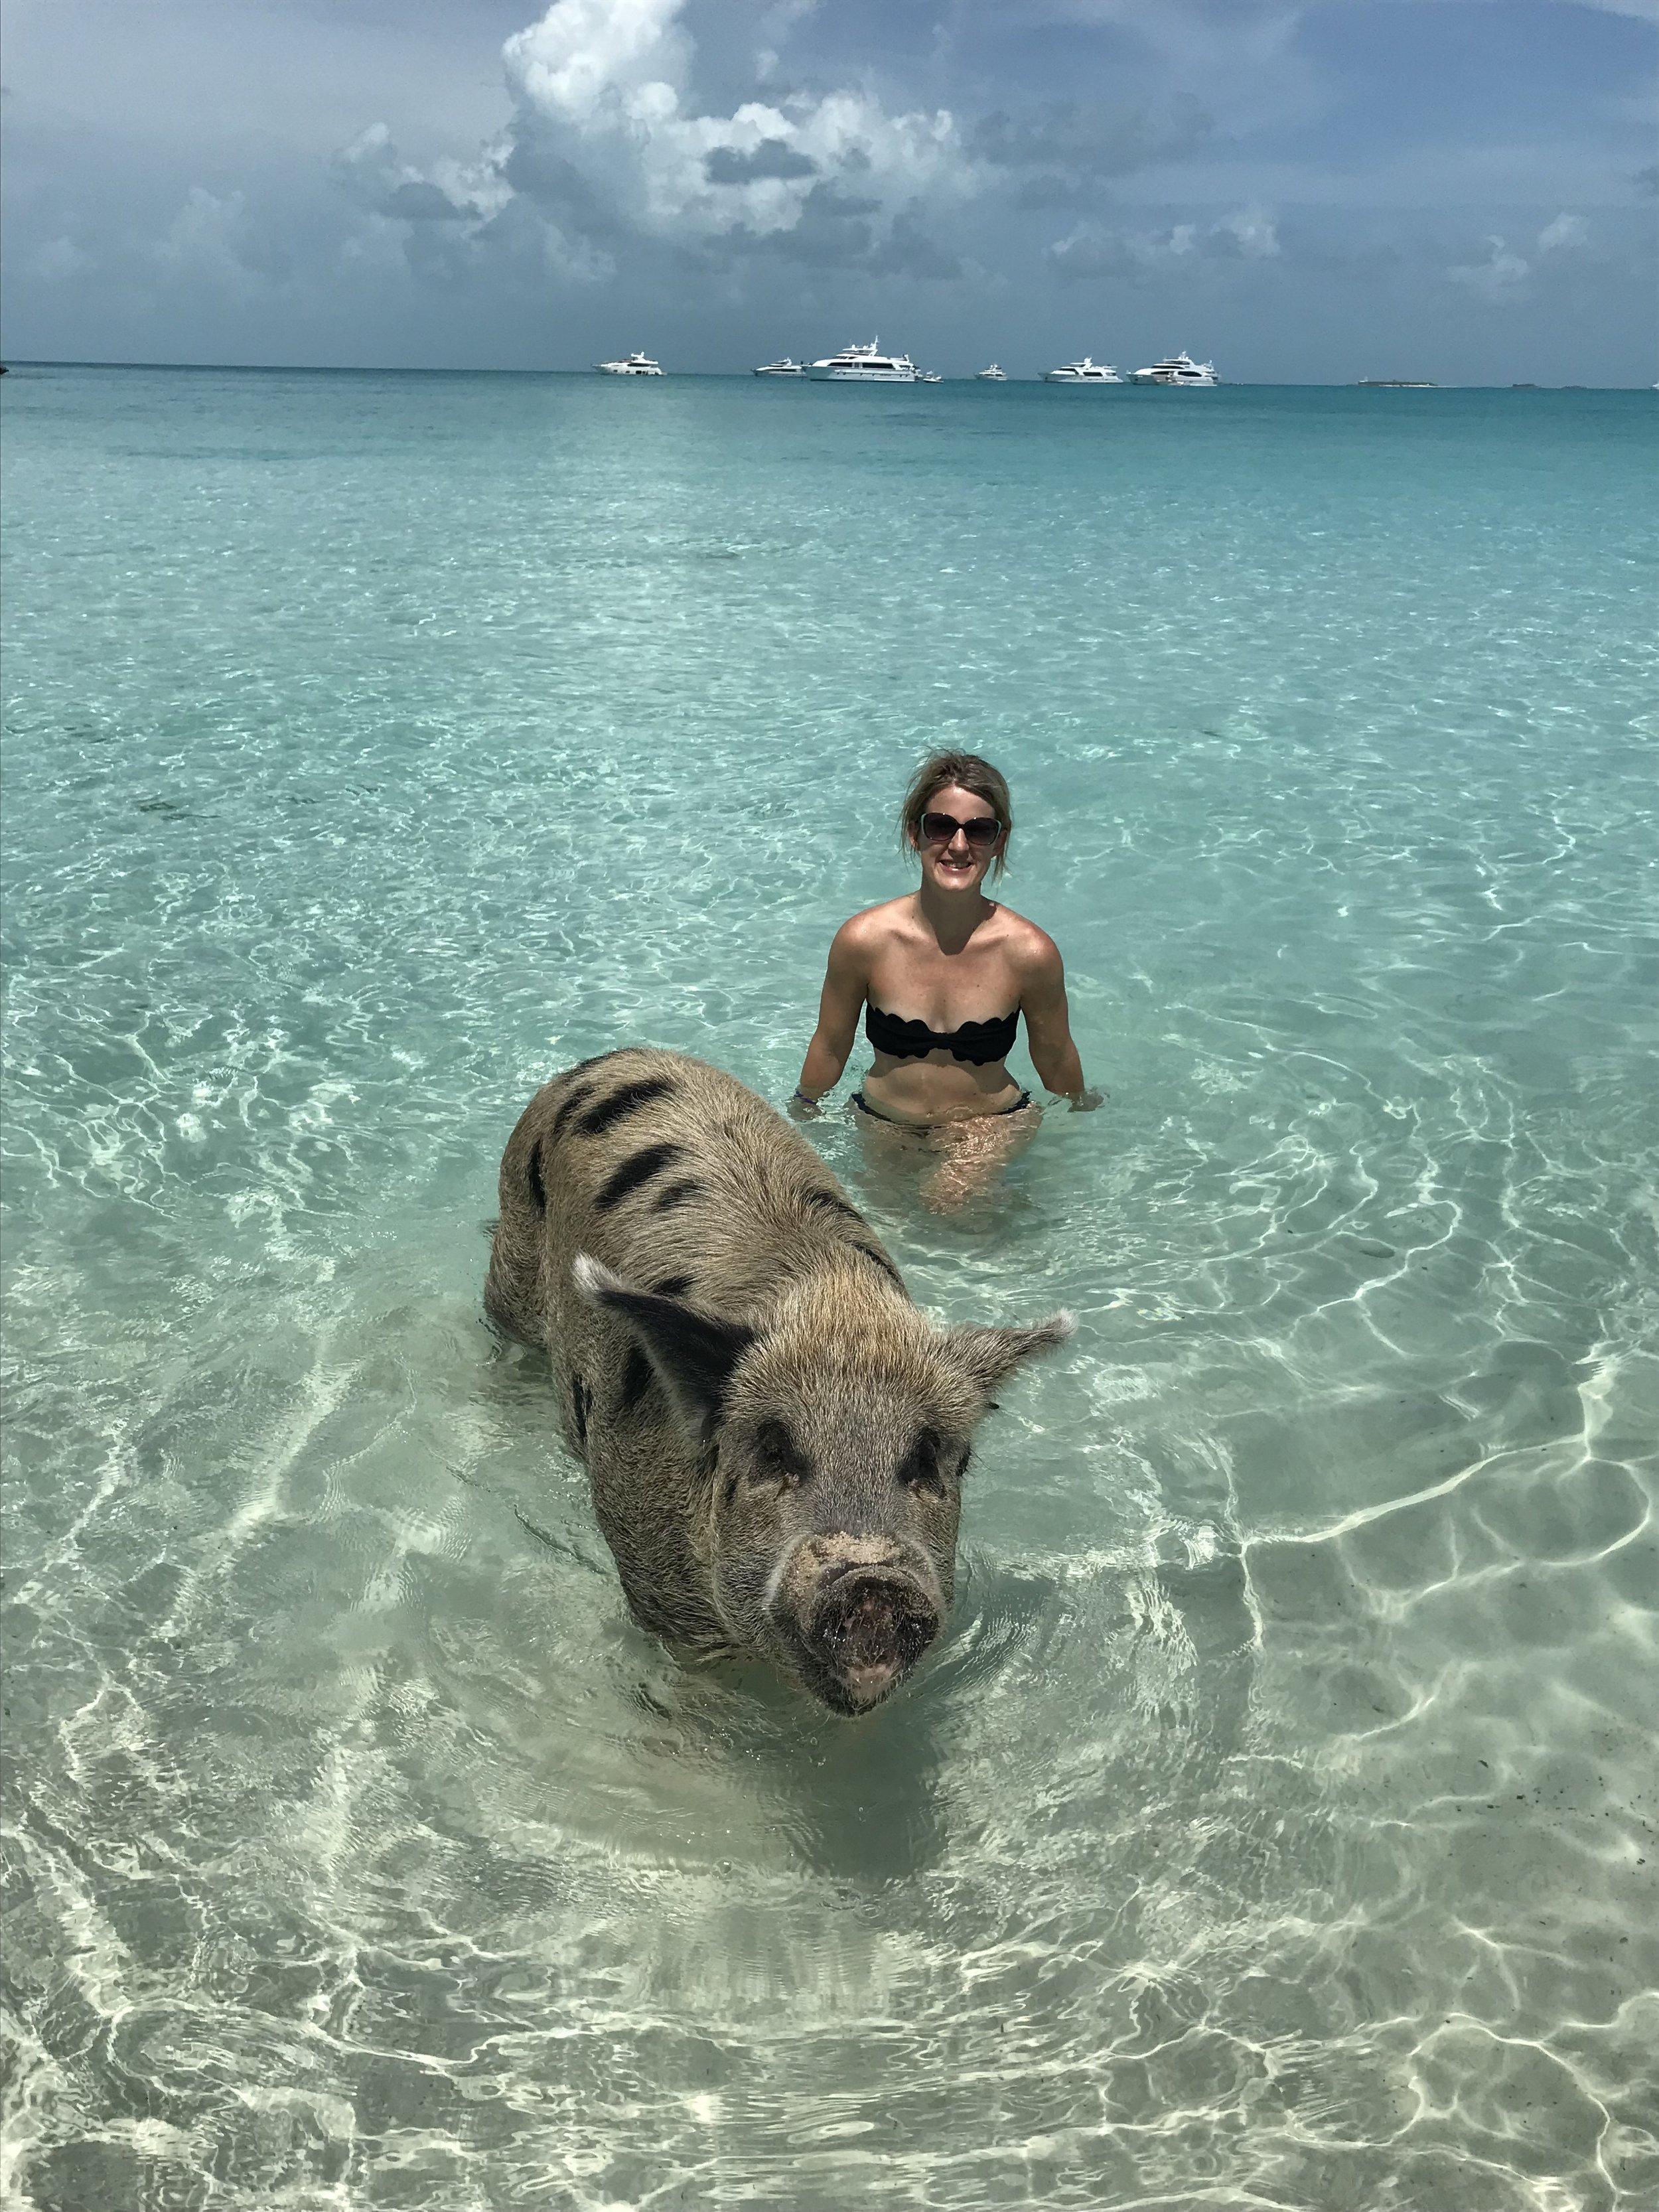 @worldwidewillett with the swimming pigs